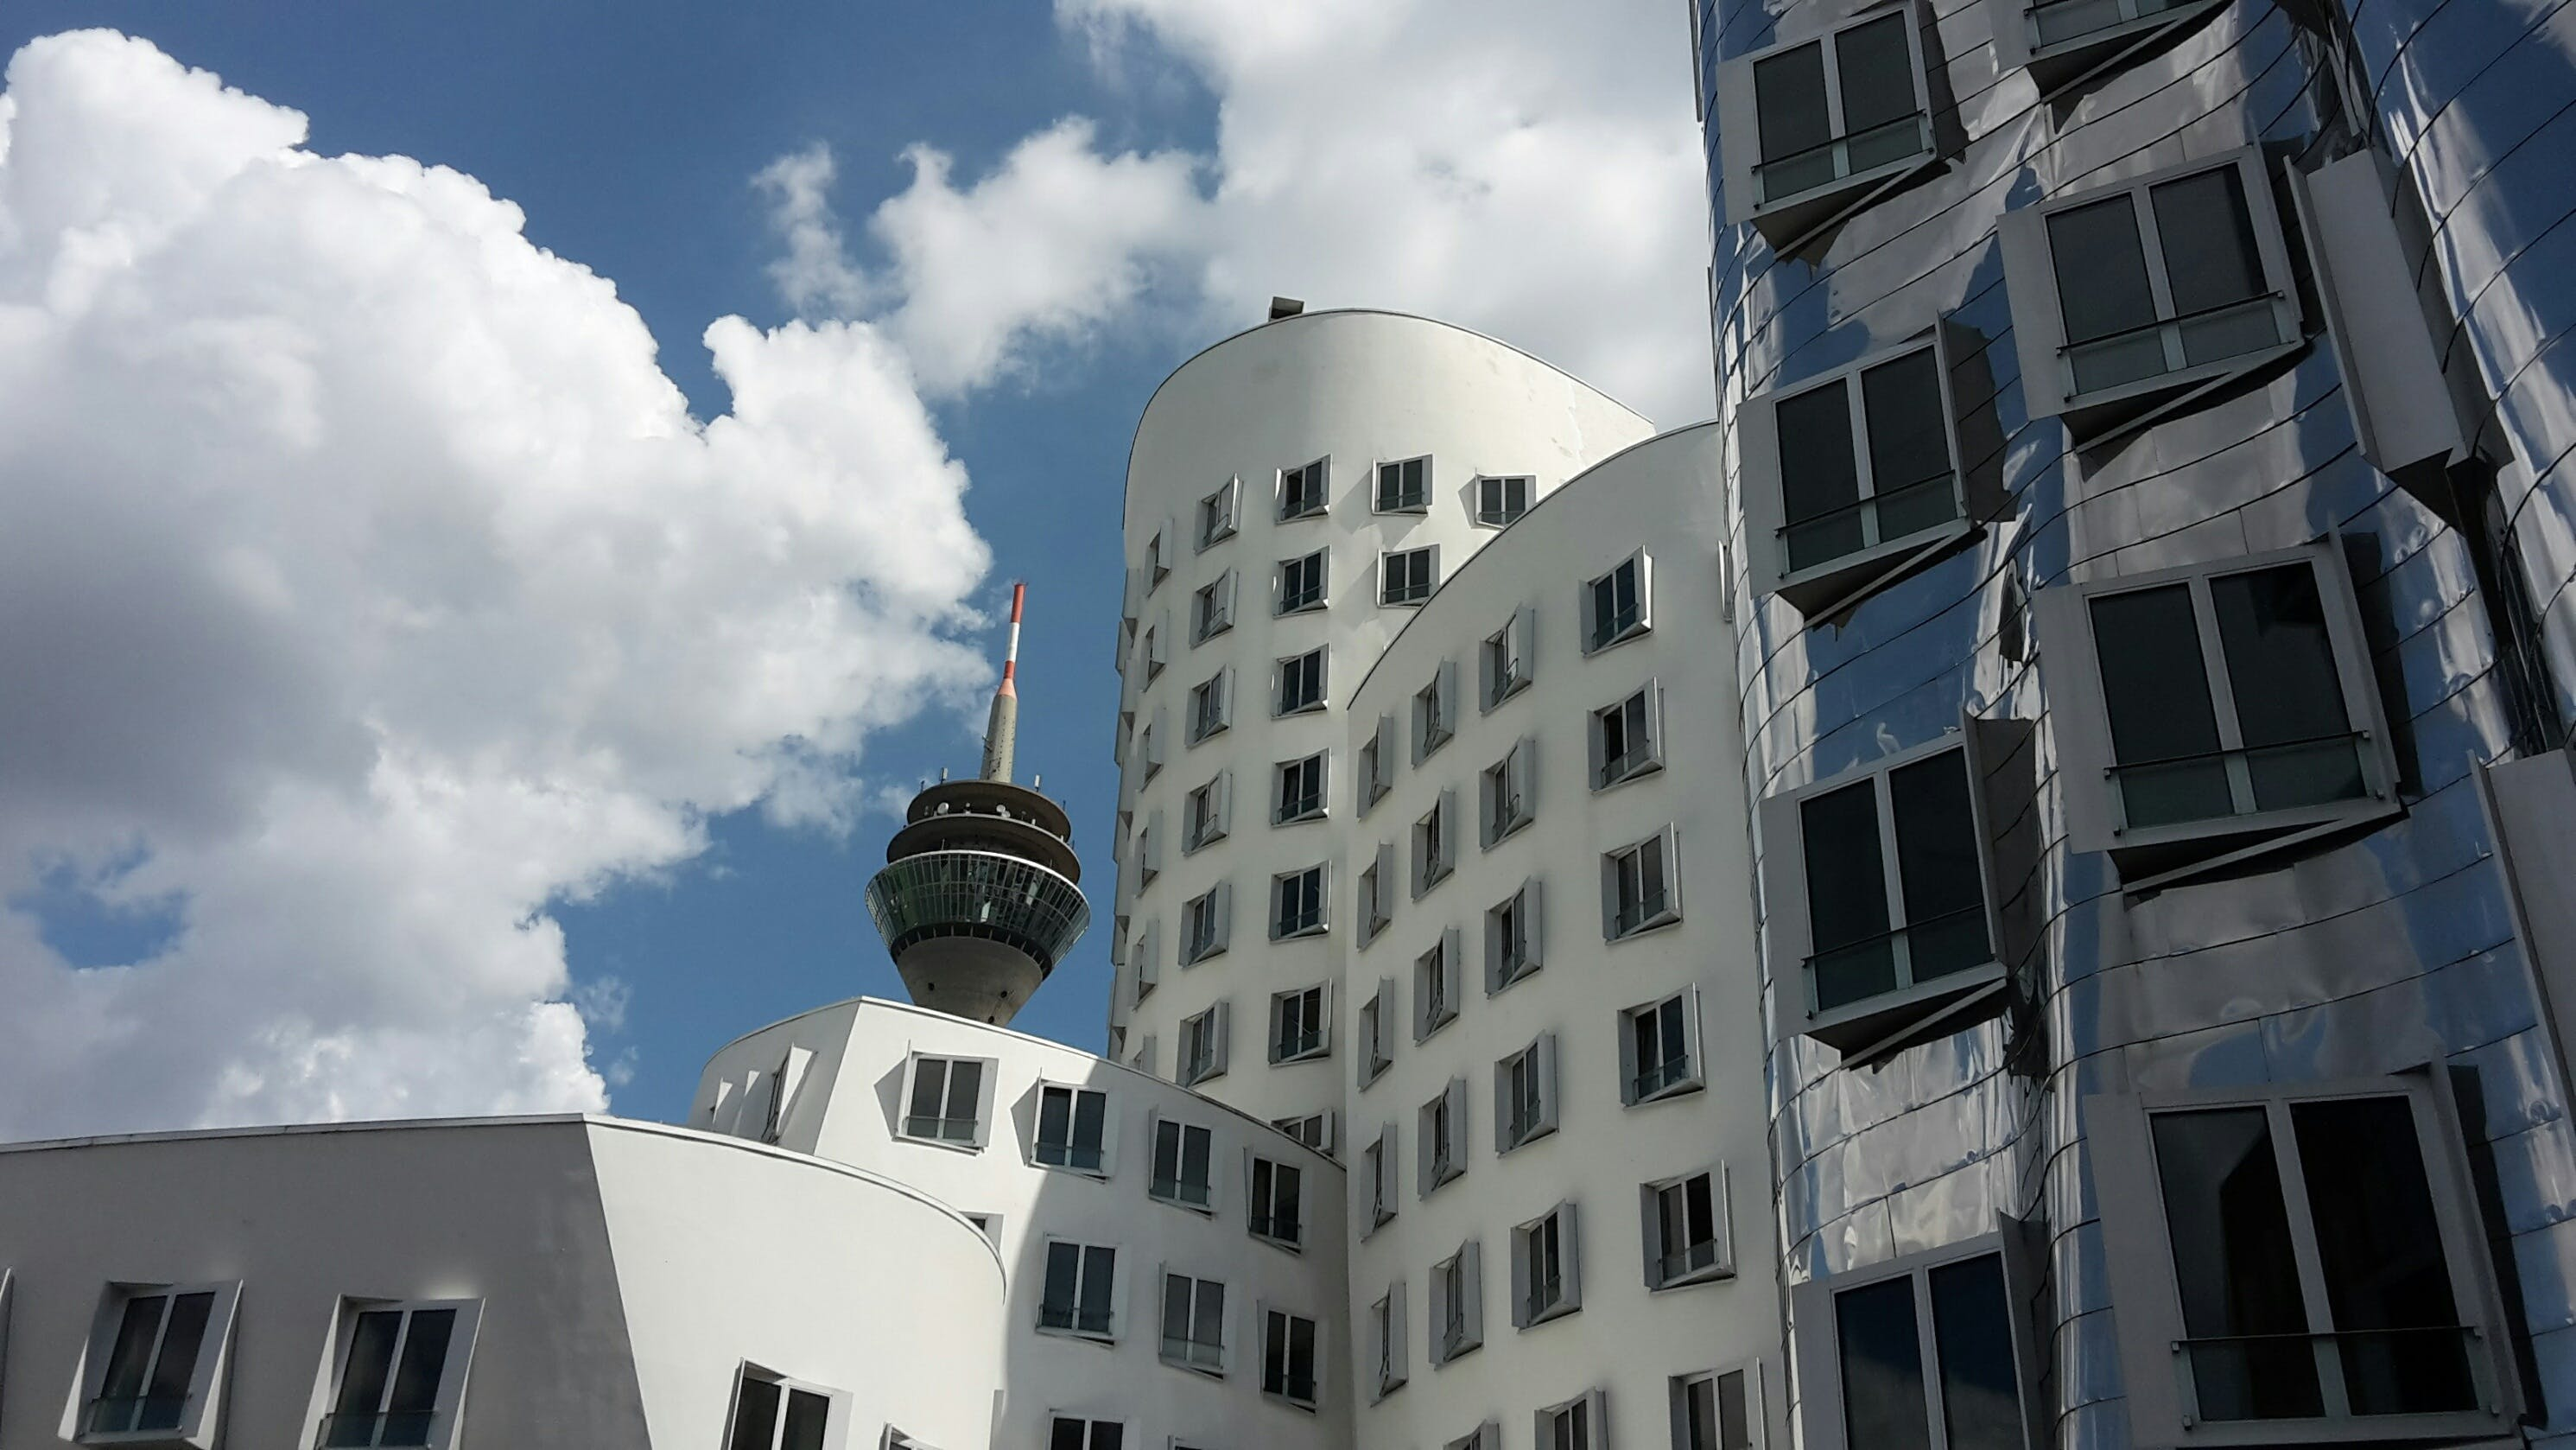 White Concrete Building Under Cloudy Sky